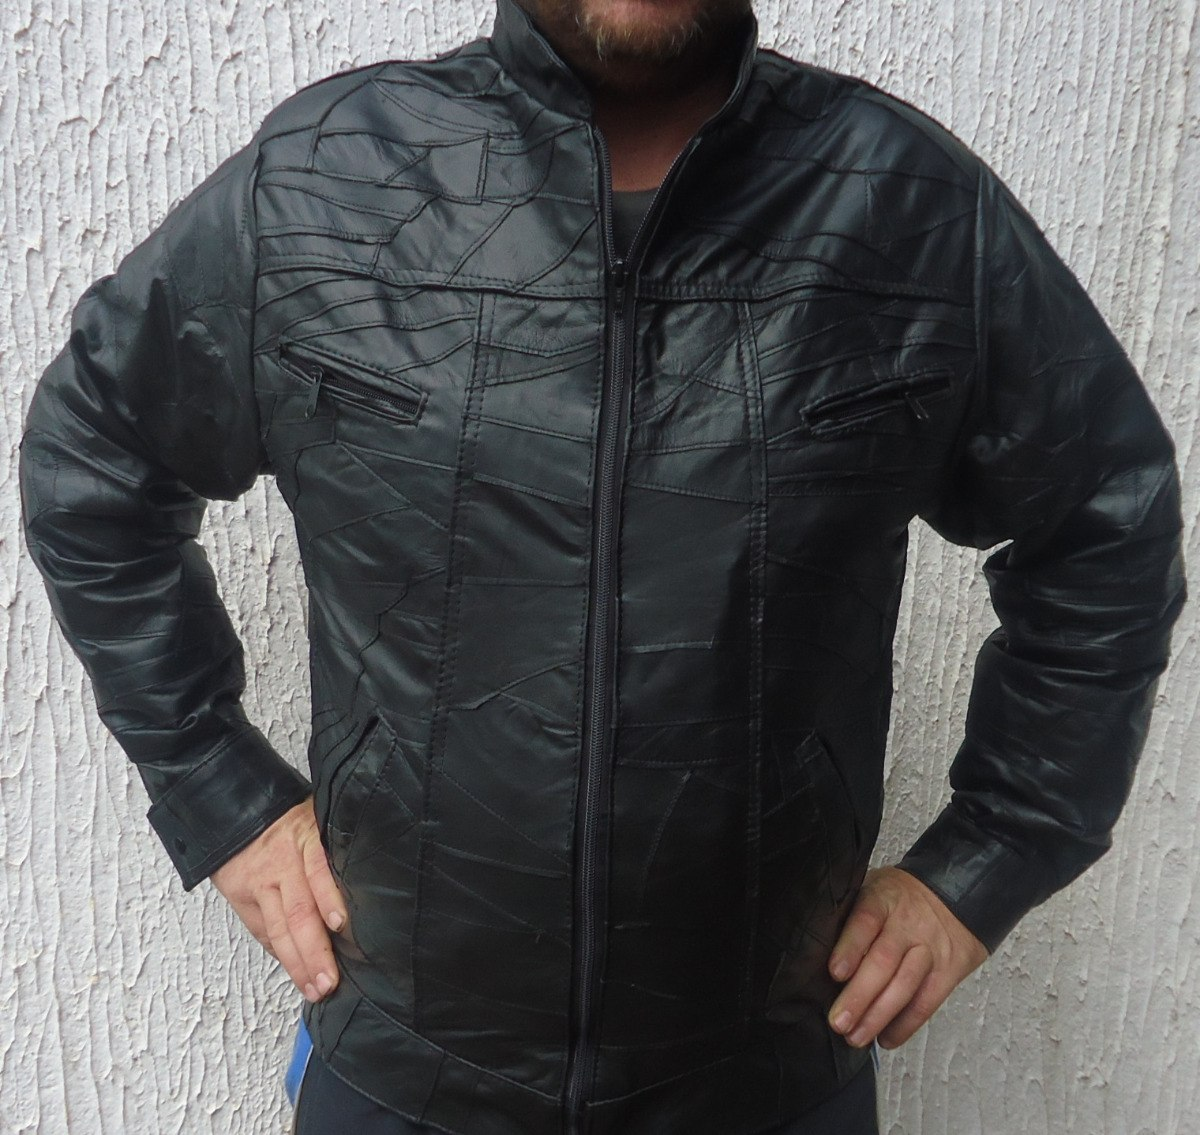 deb06b178 jaqueta masculina couro legitimo casaco masculinoem retalhos. Carregando  zoom.